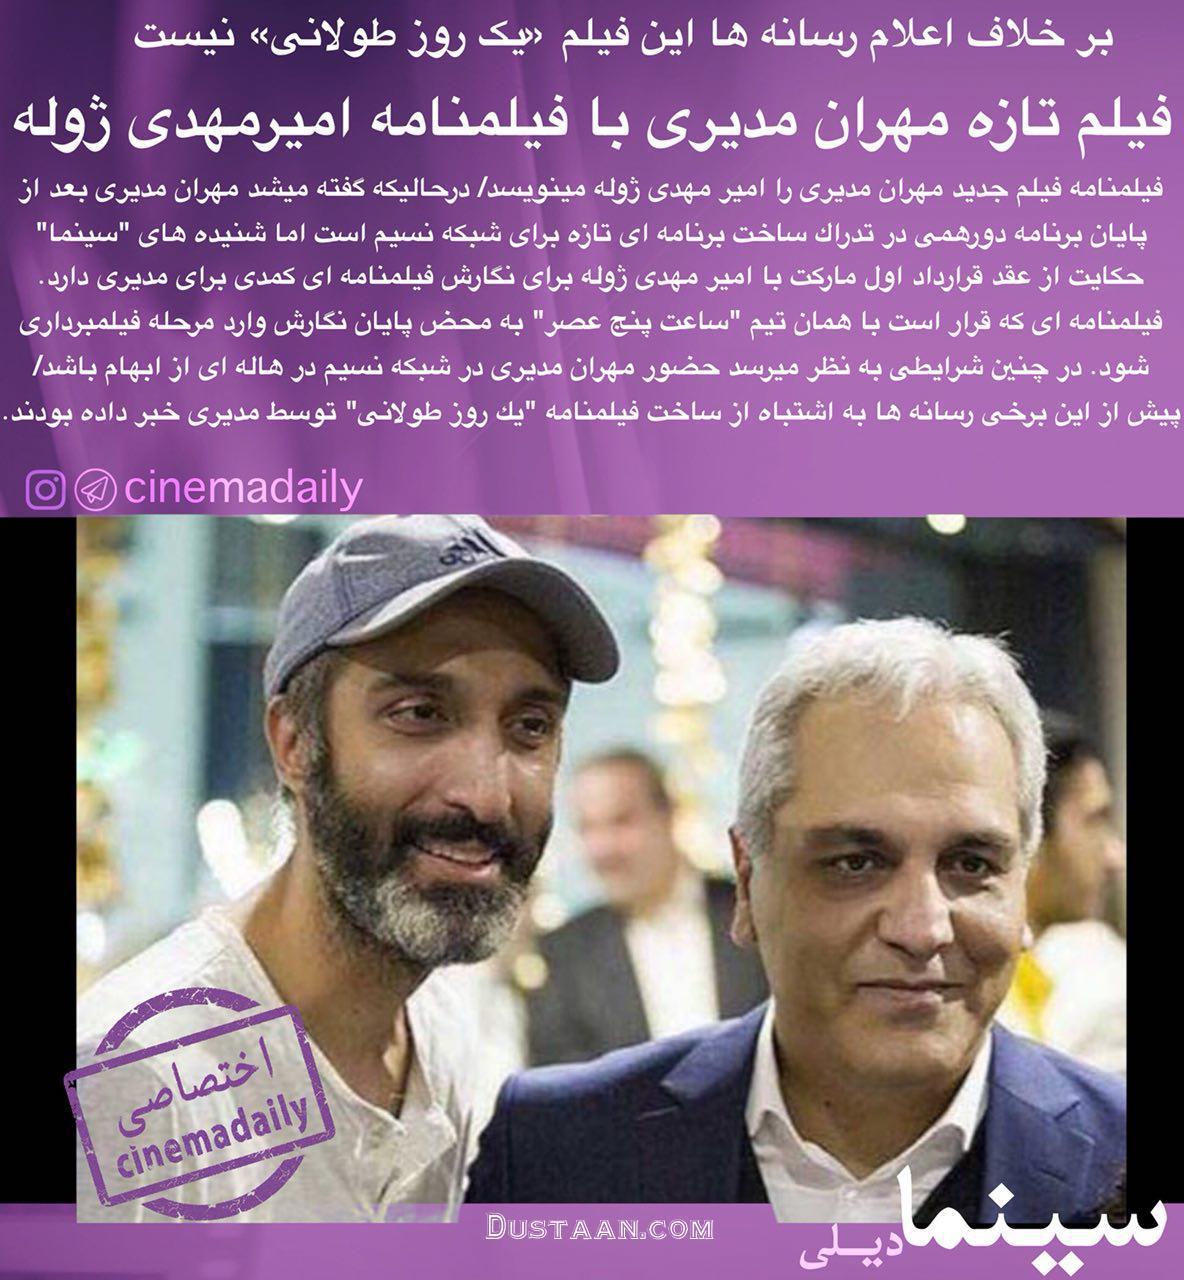 www.dustaan.com فیلم جدید مهران مدیری با فیلم نامه امیرمهدی ژوله +عکس